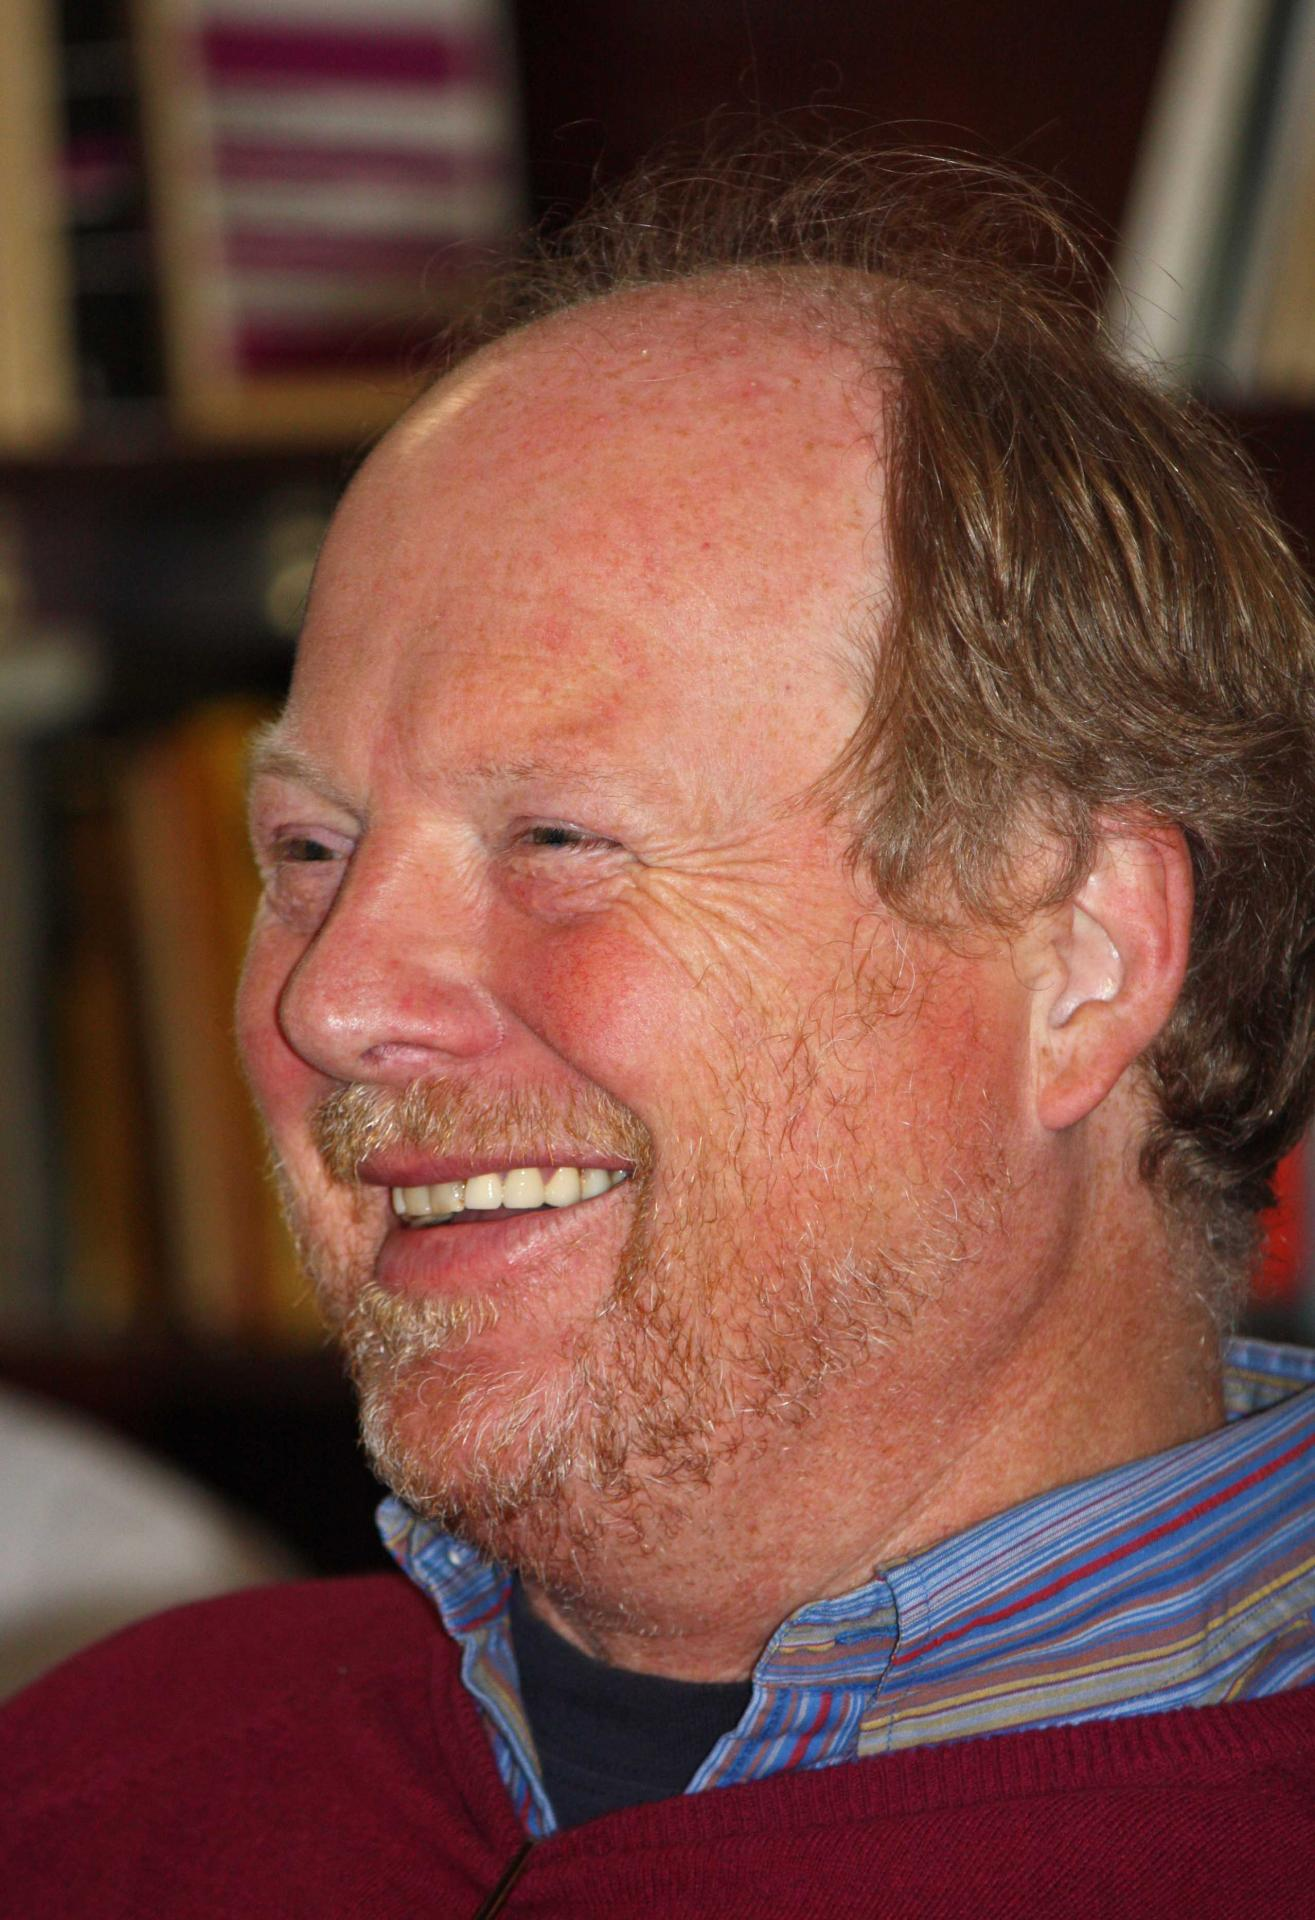 Thomas Triebler